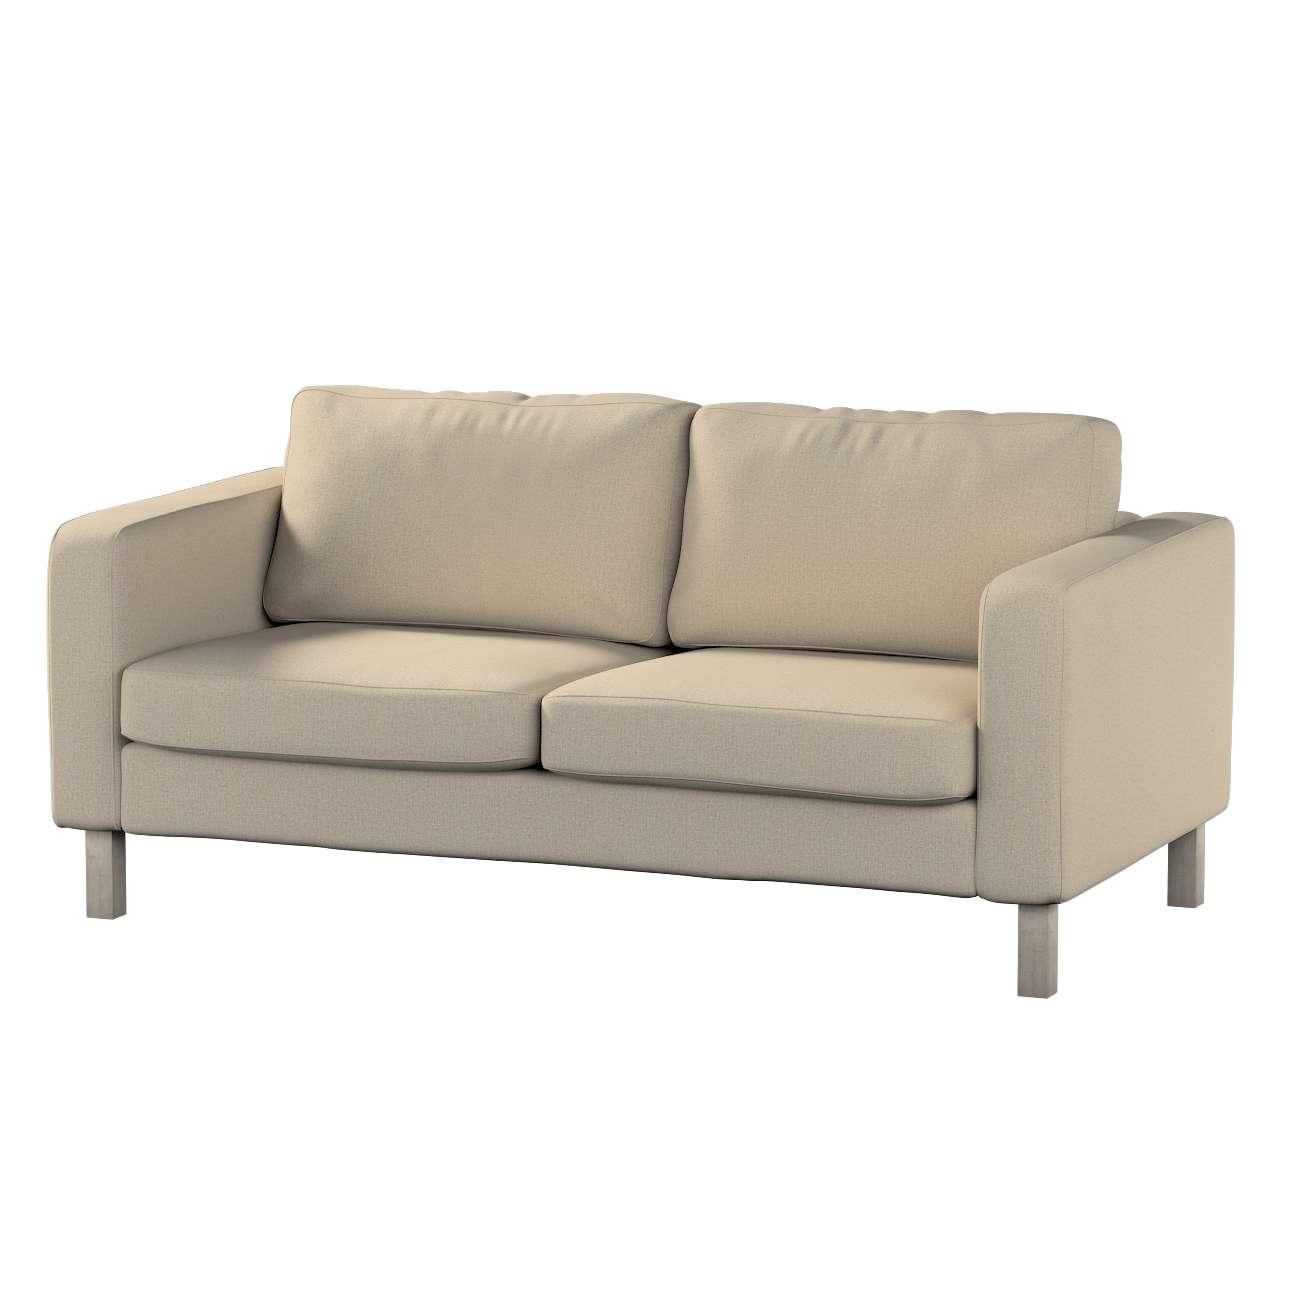 KARSLTAD dvivietės sofos užvalkalas Karlstad 2-vietės sofos užvalkalas kolekcijoje Edinburgh , audinys: 115-78